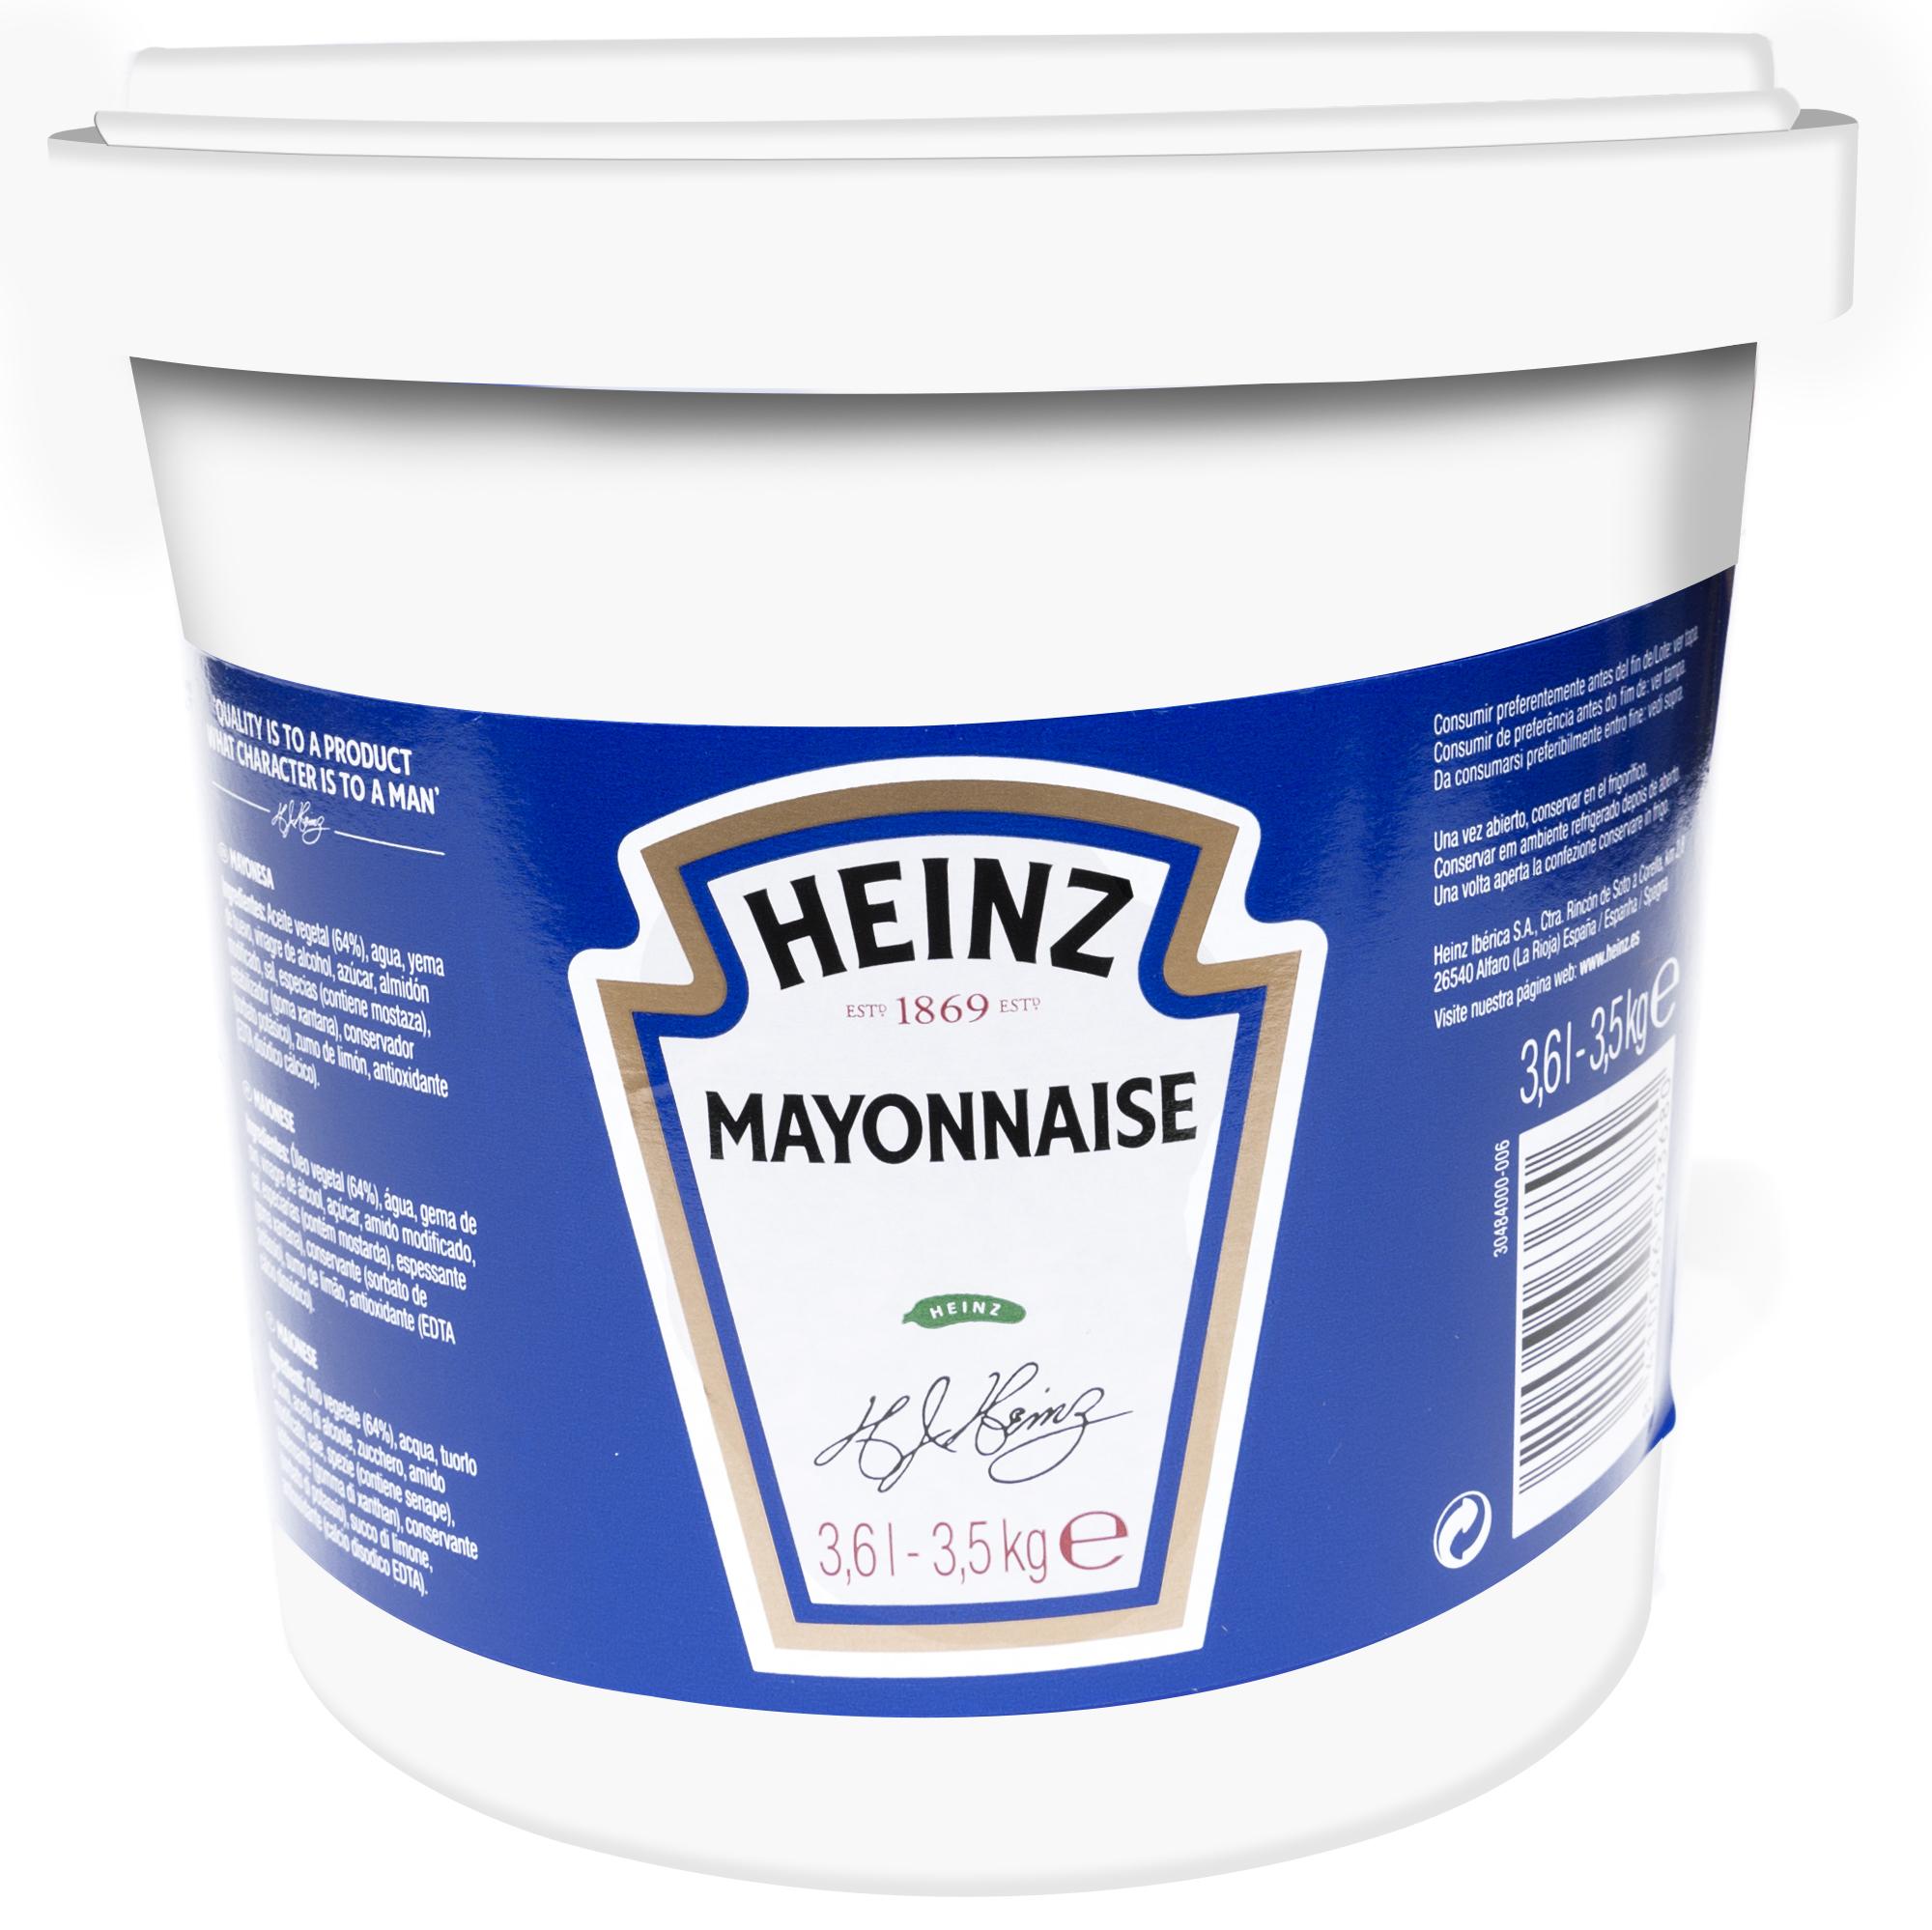 Heinz Mayonnaise 3.6l image